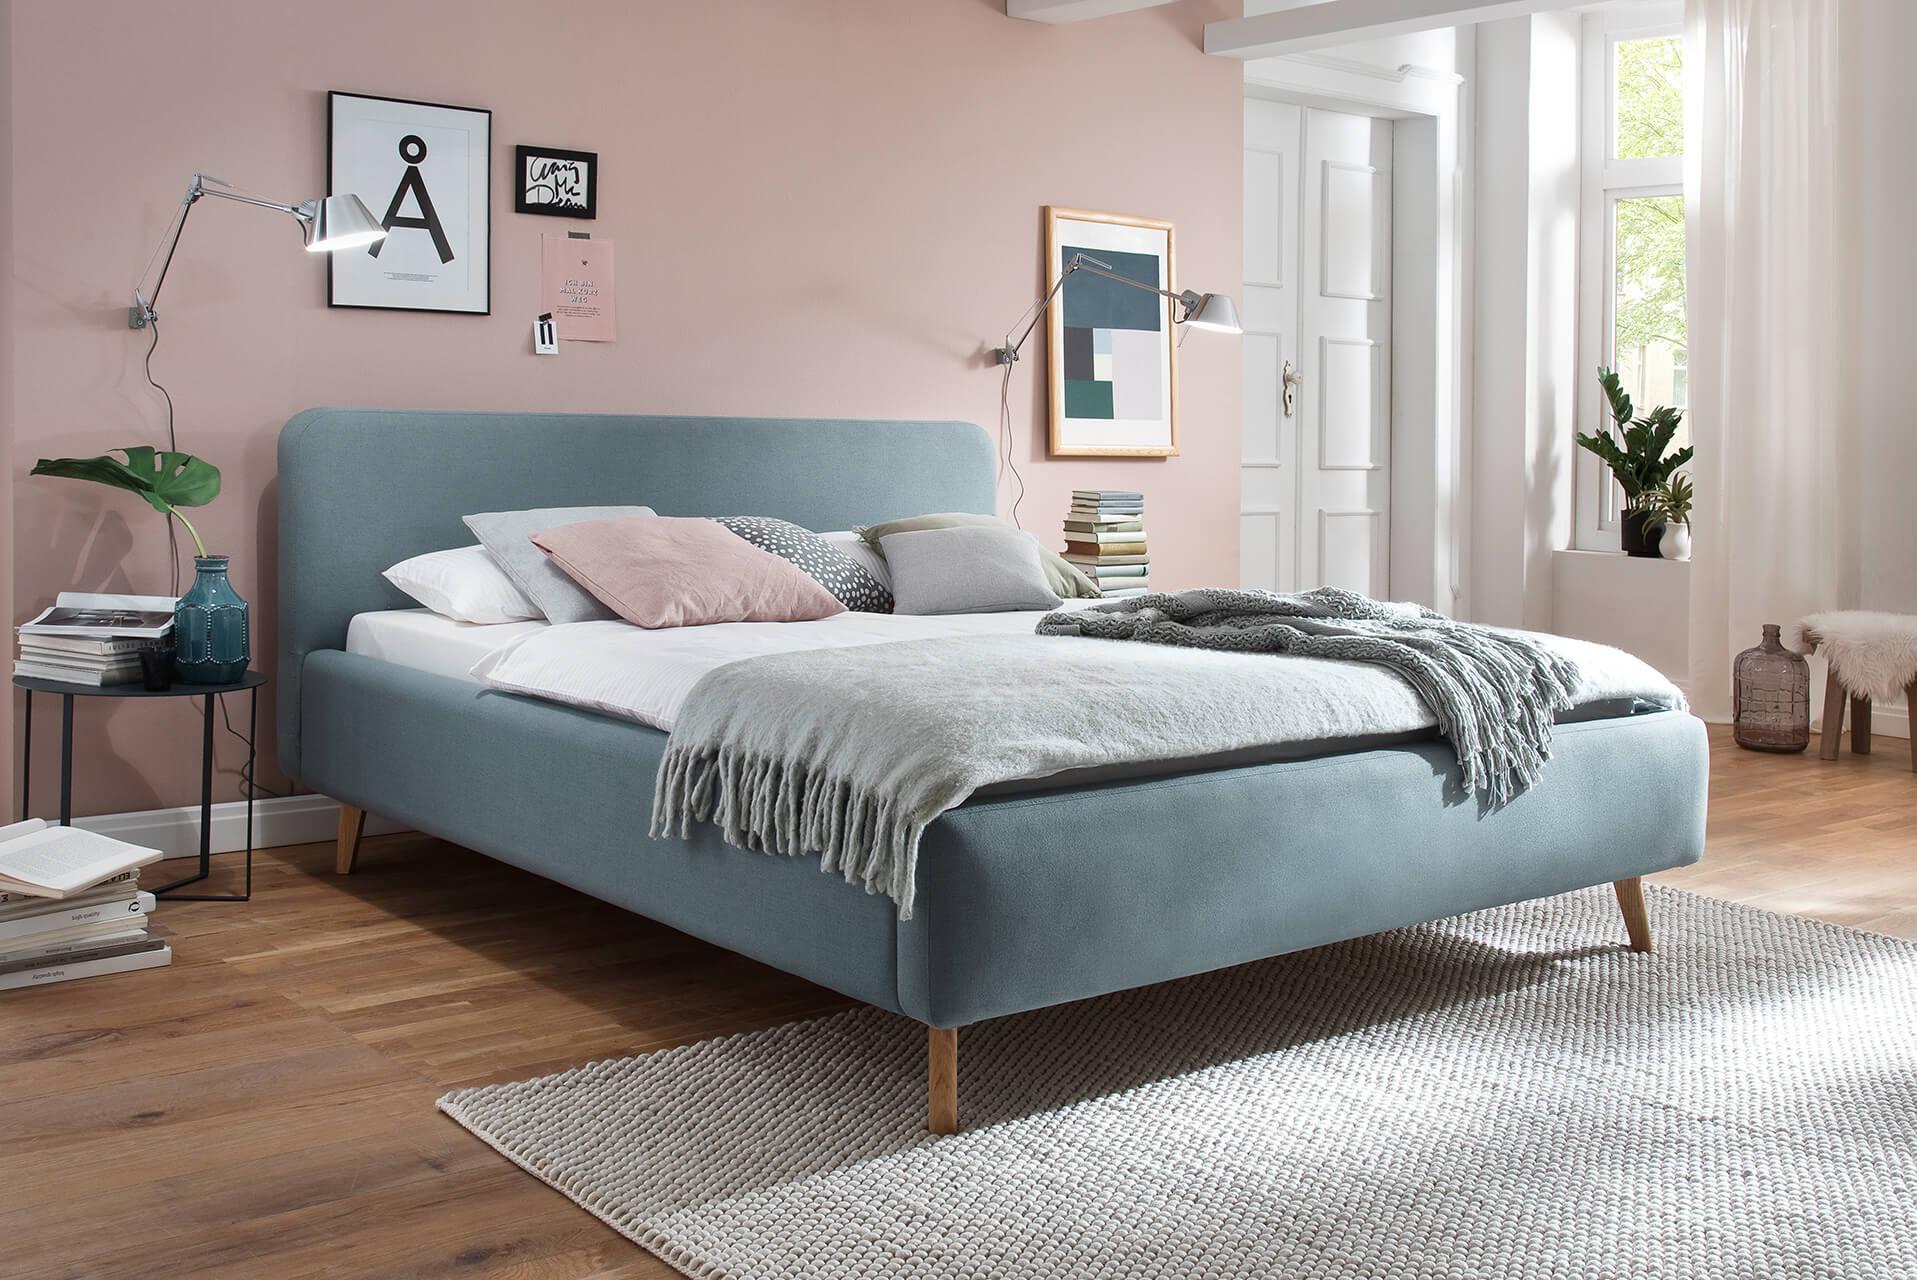 Full Size of Polsterbett 200x220 Wasserbett Mit Komplettem Zubehr Fano Suma Betten Bett Wohnzimmer Polsterbett 200x220